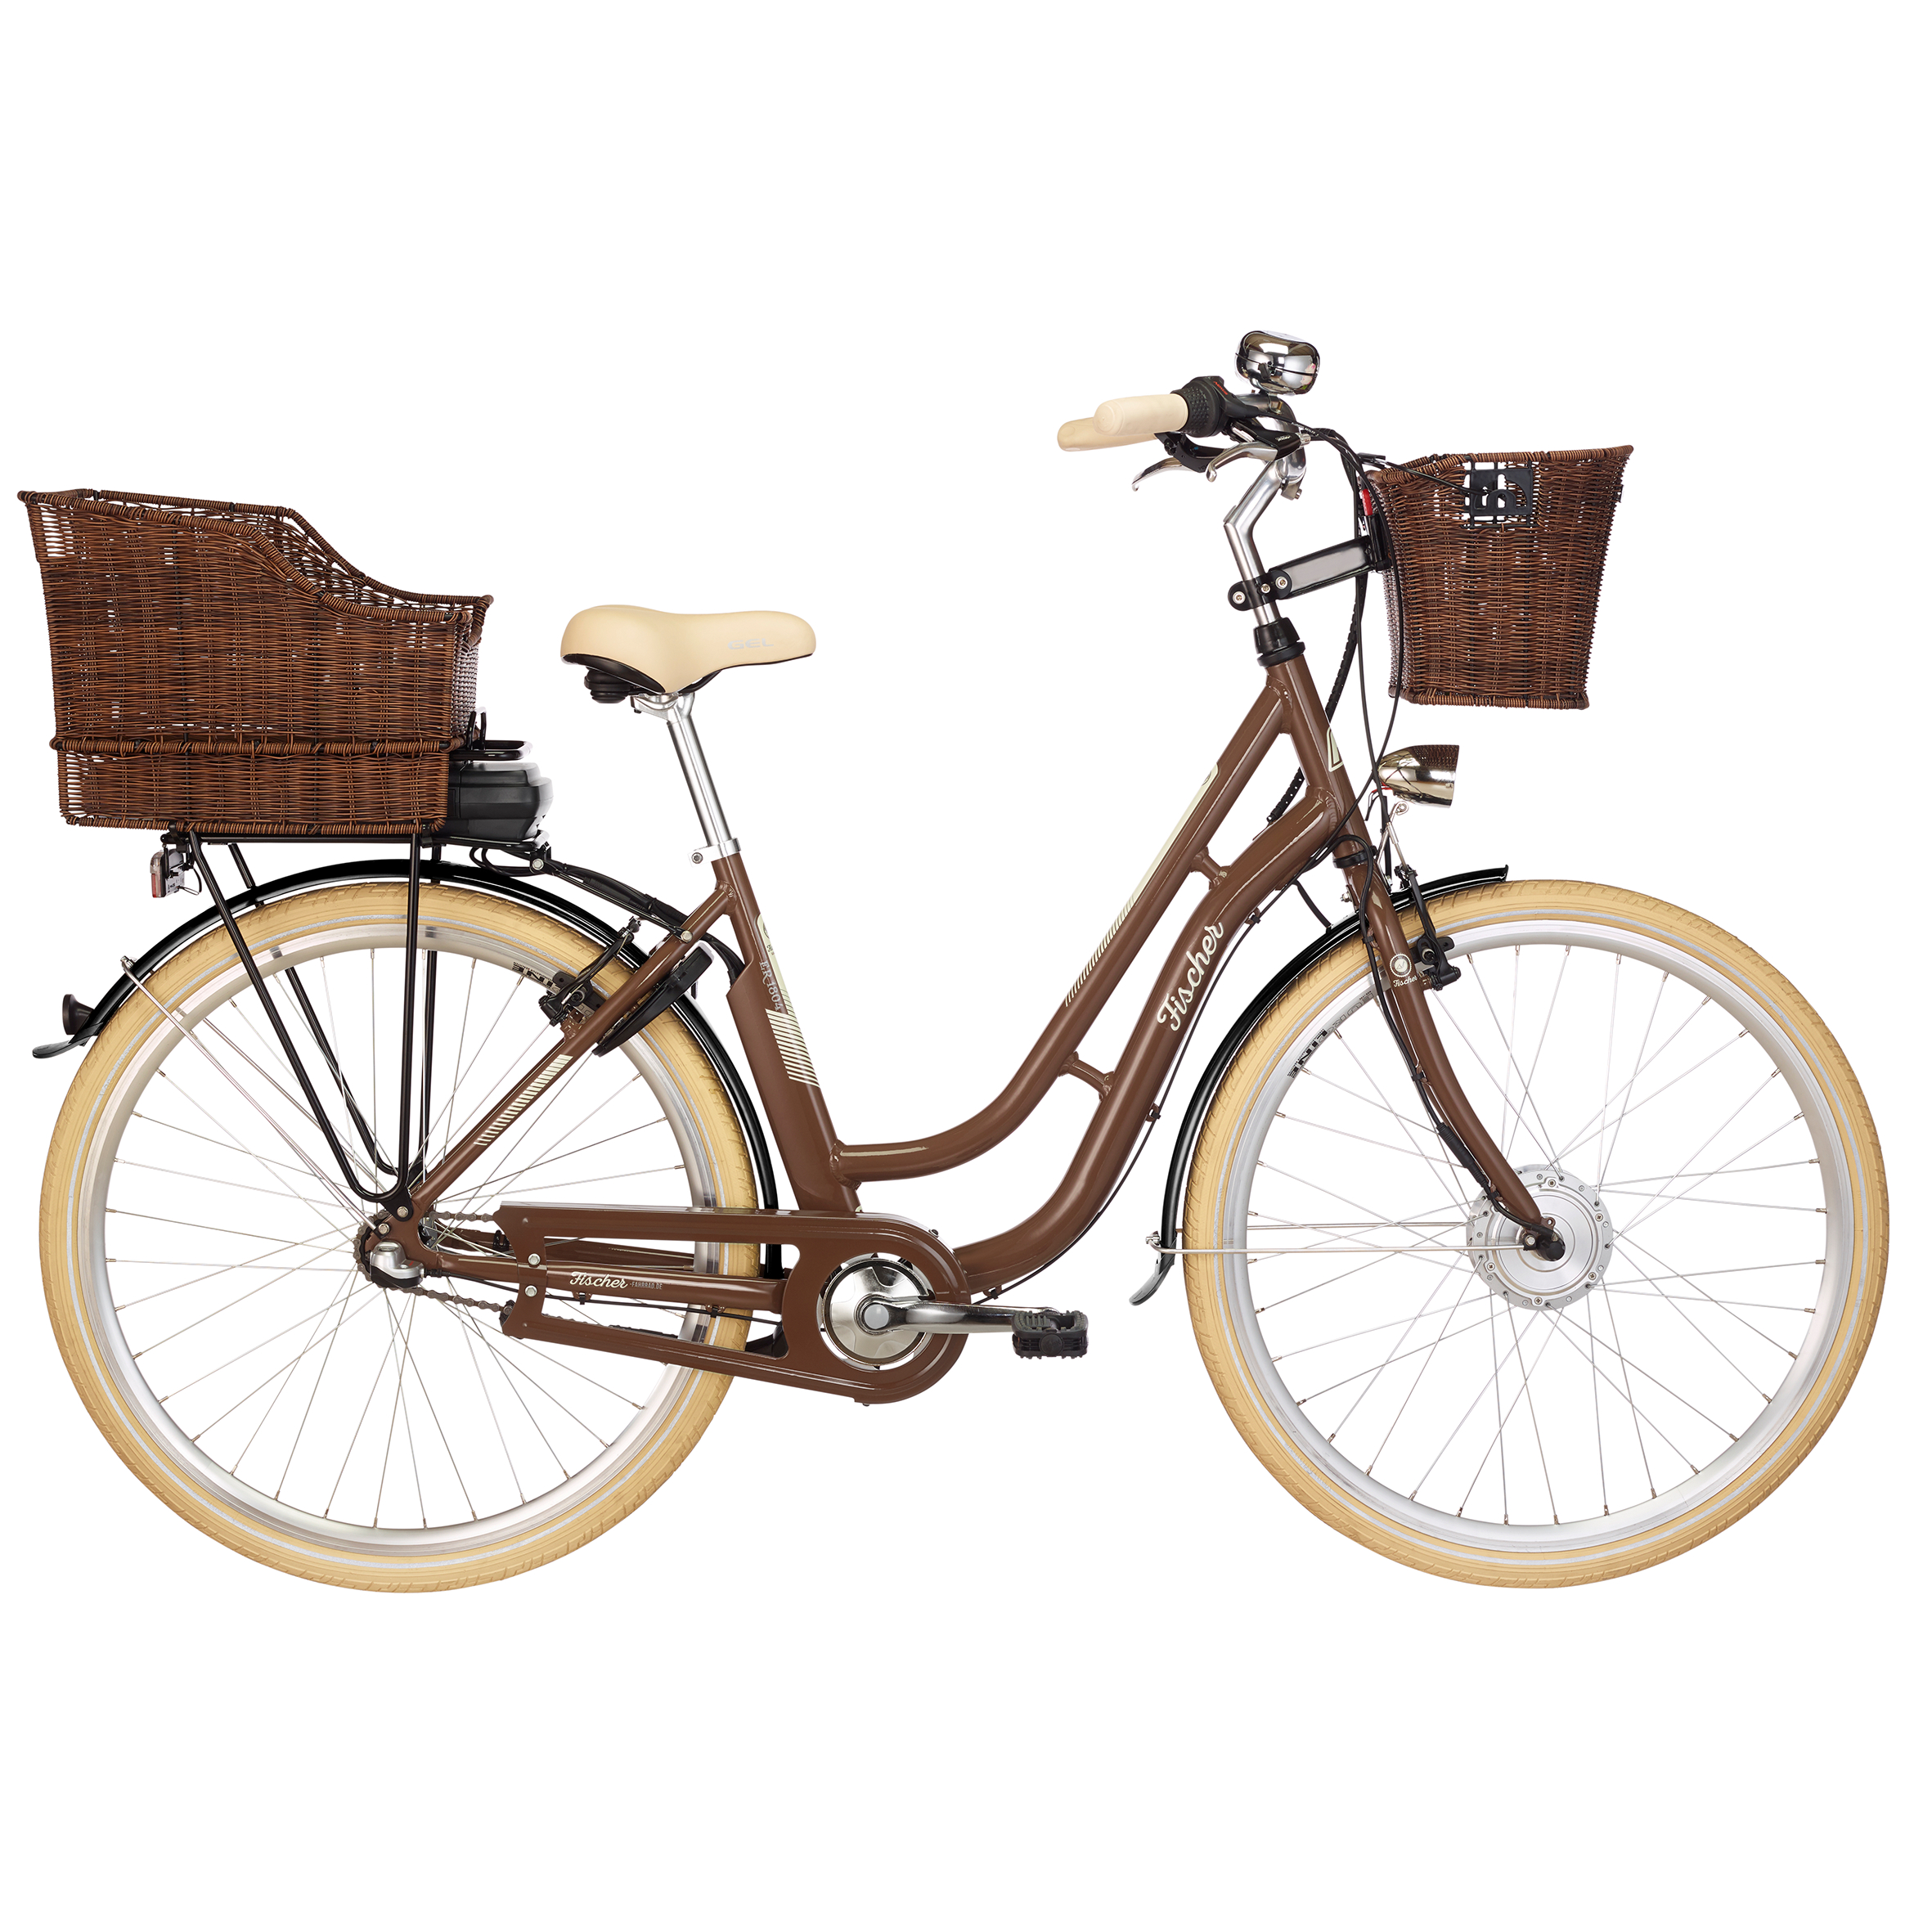 fischer er 1804 s2 damen city e bike nussbraun retro e bikes e bikes fischer fahrradshop. Black Bedroom Furniture Sets. Home Design Ideas